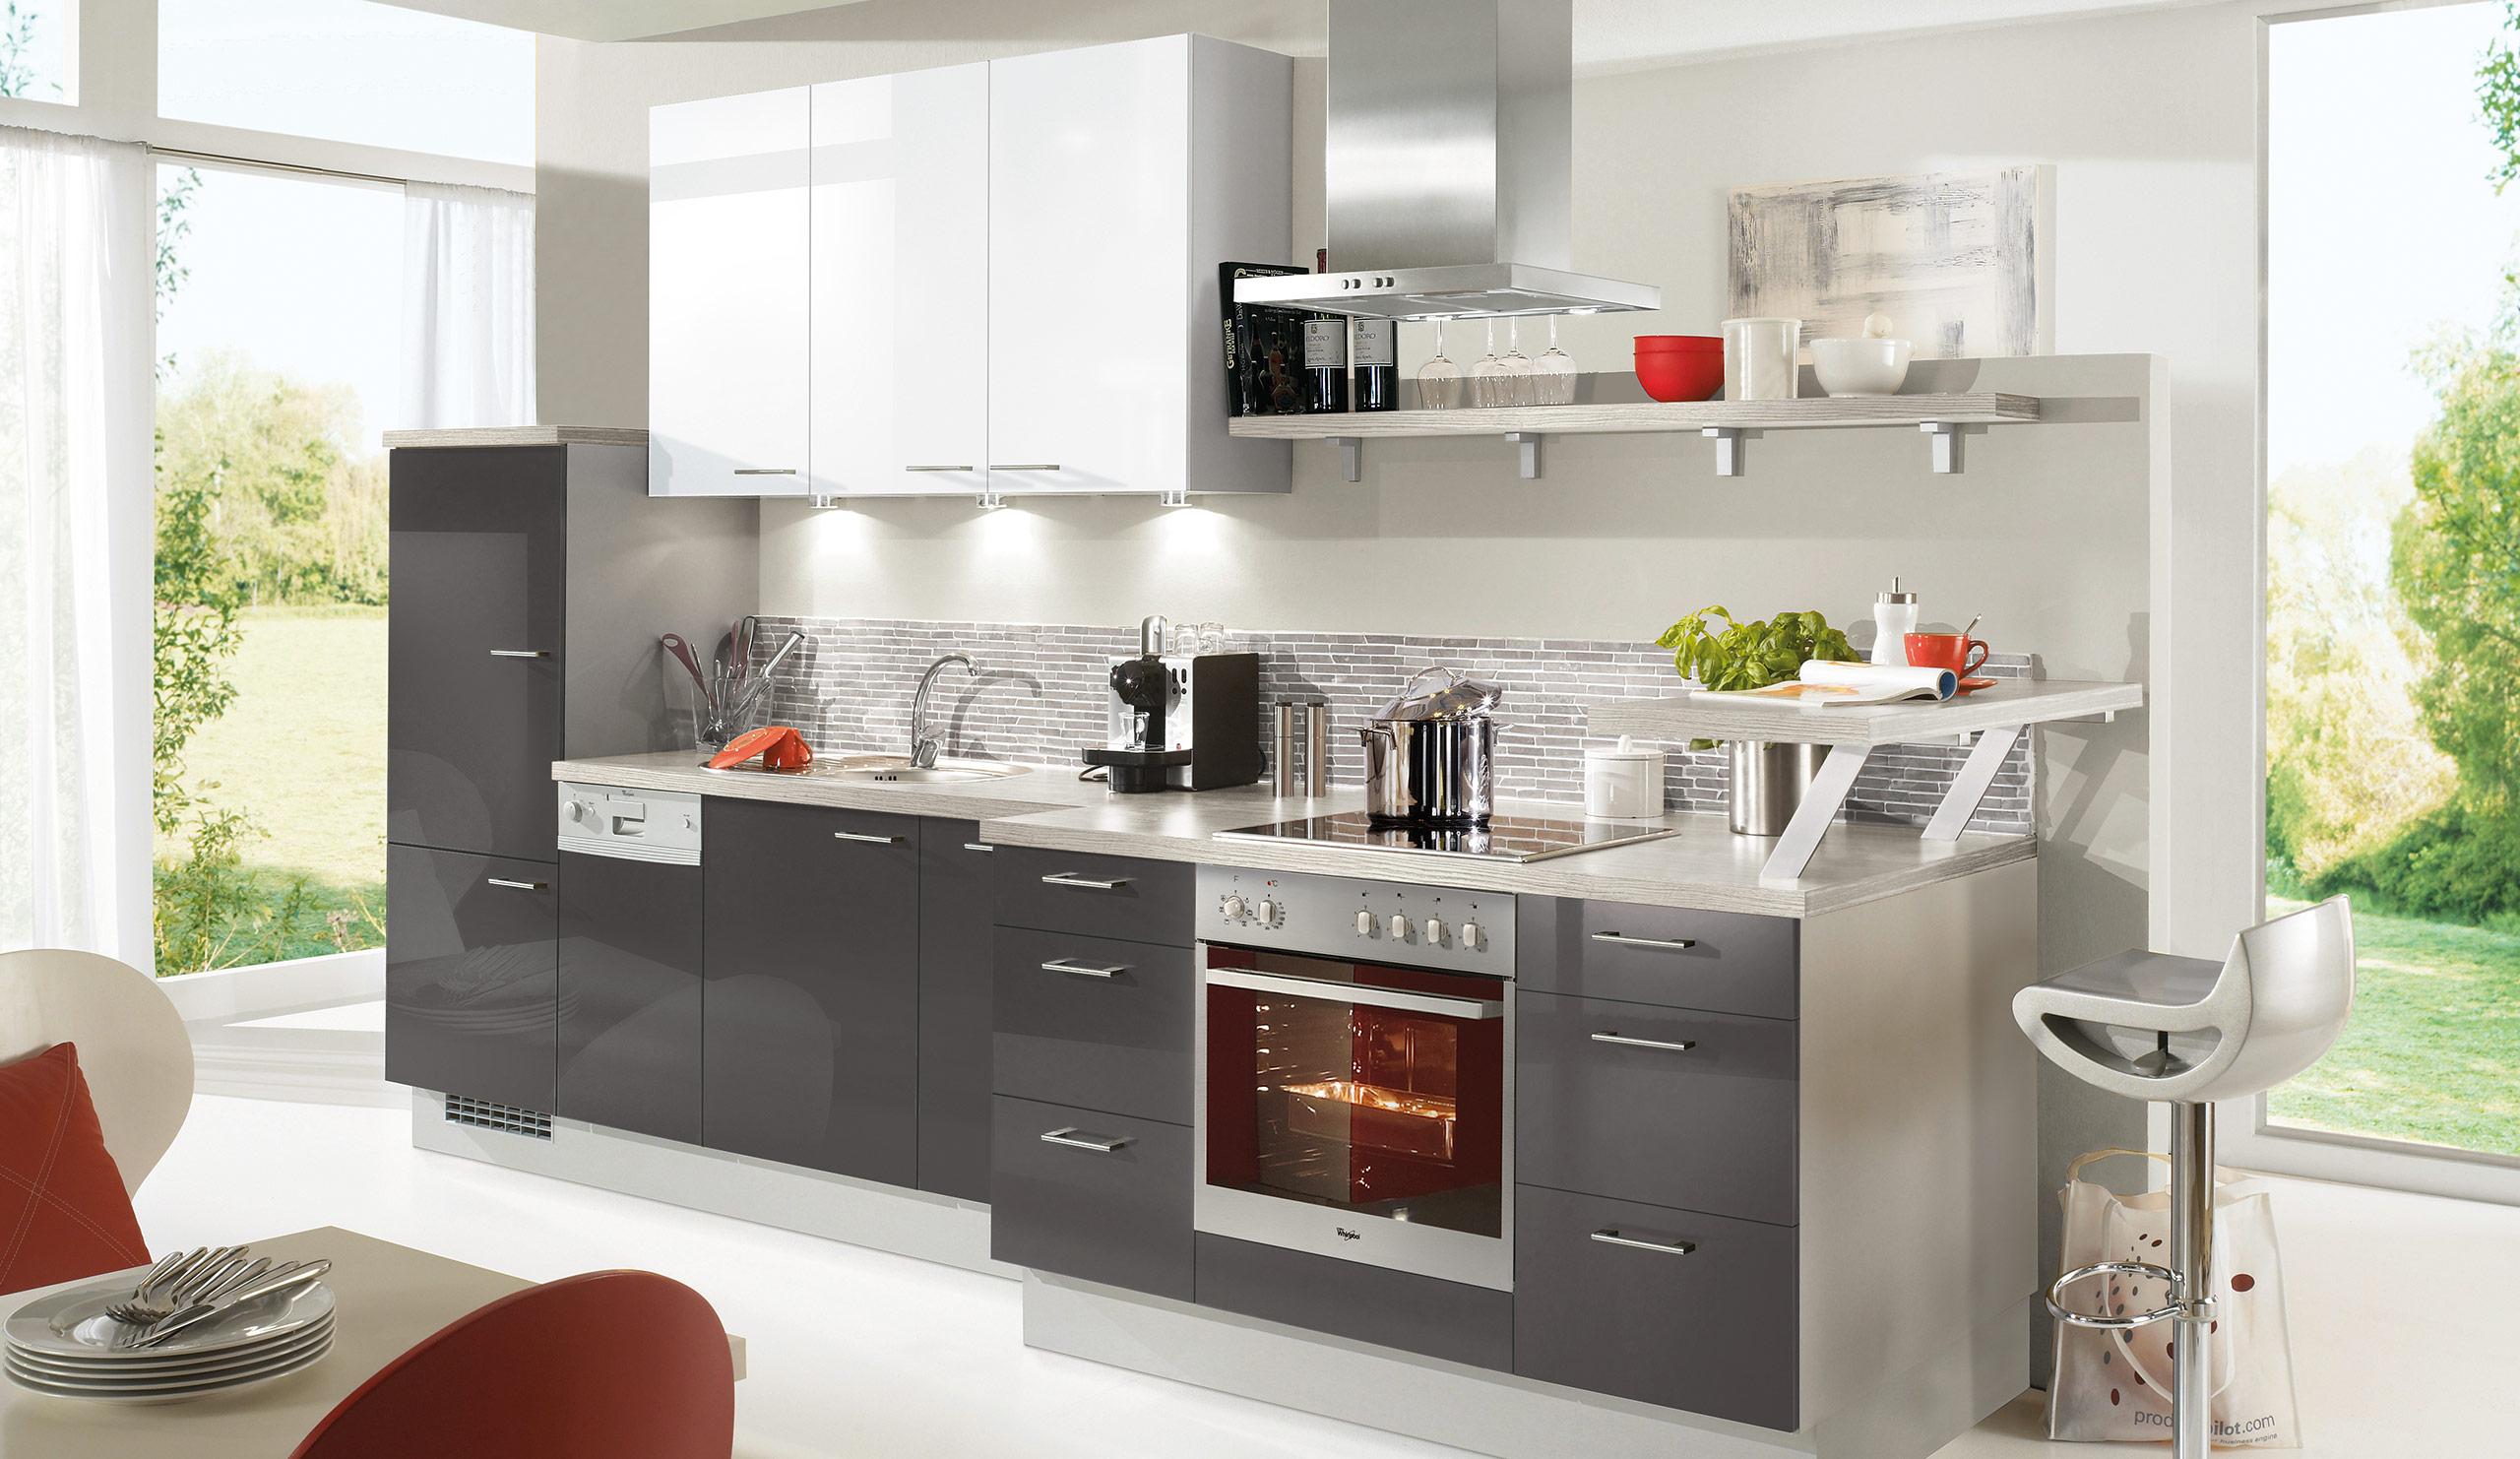 k chen quelle k cheninspiration. Black Bedroom Furniture Sets. Home Design Ideas